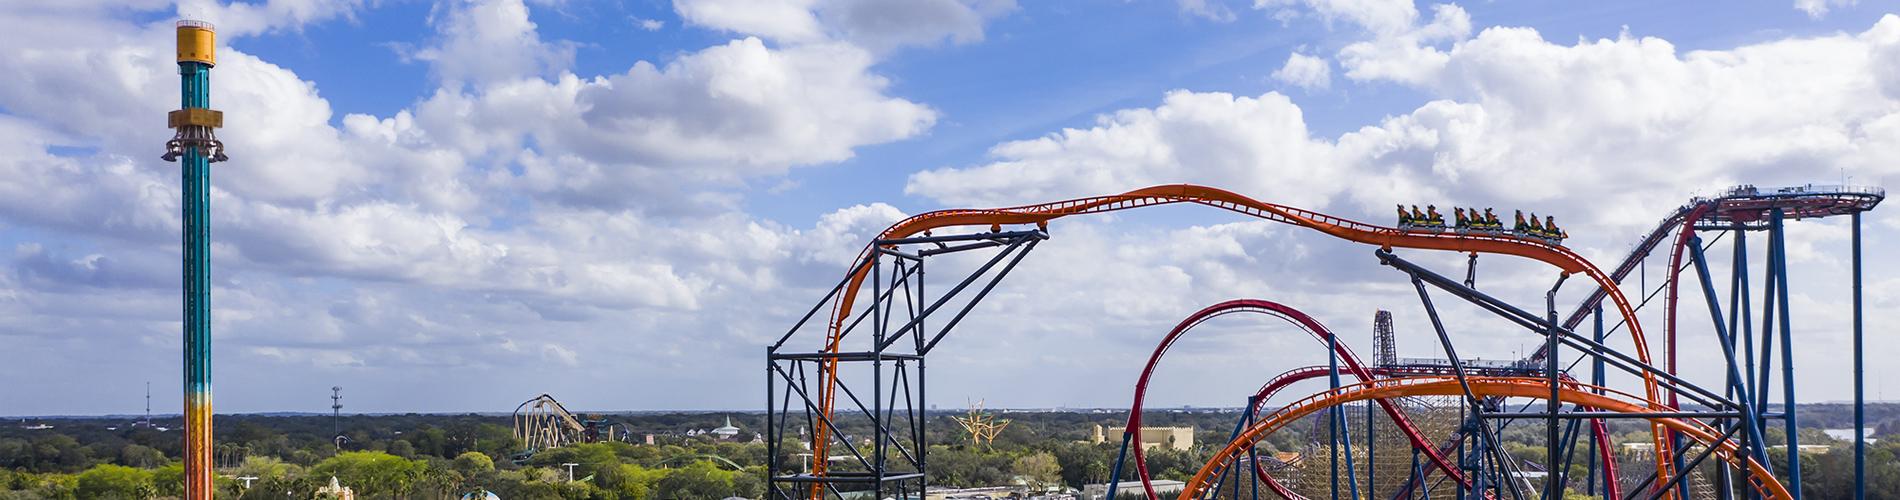 Falcon's Fury, Tigris and SheiKra at Busch Gardens Tampa